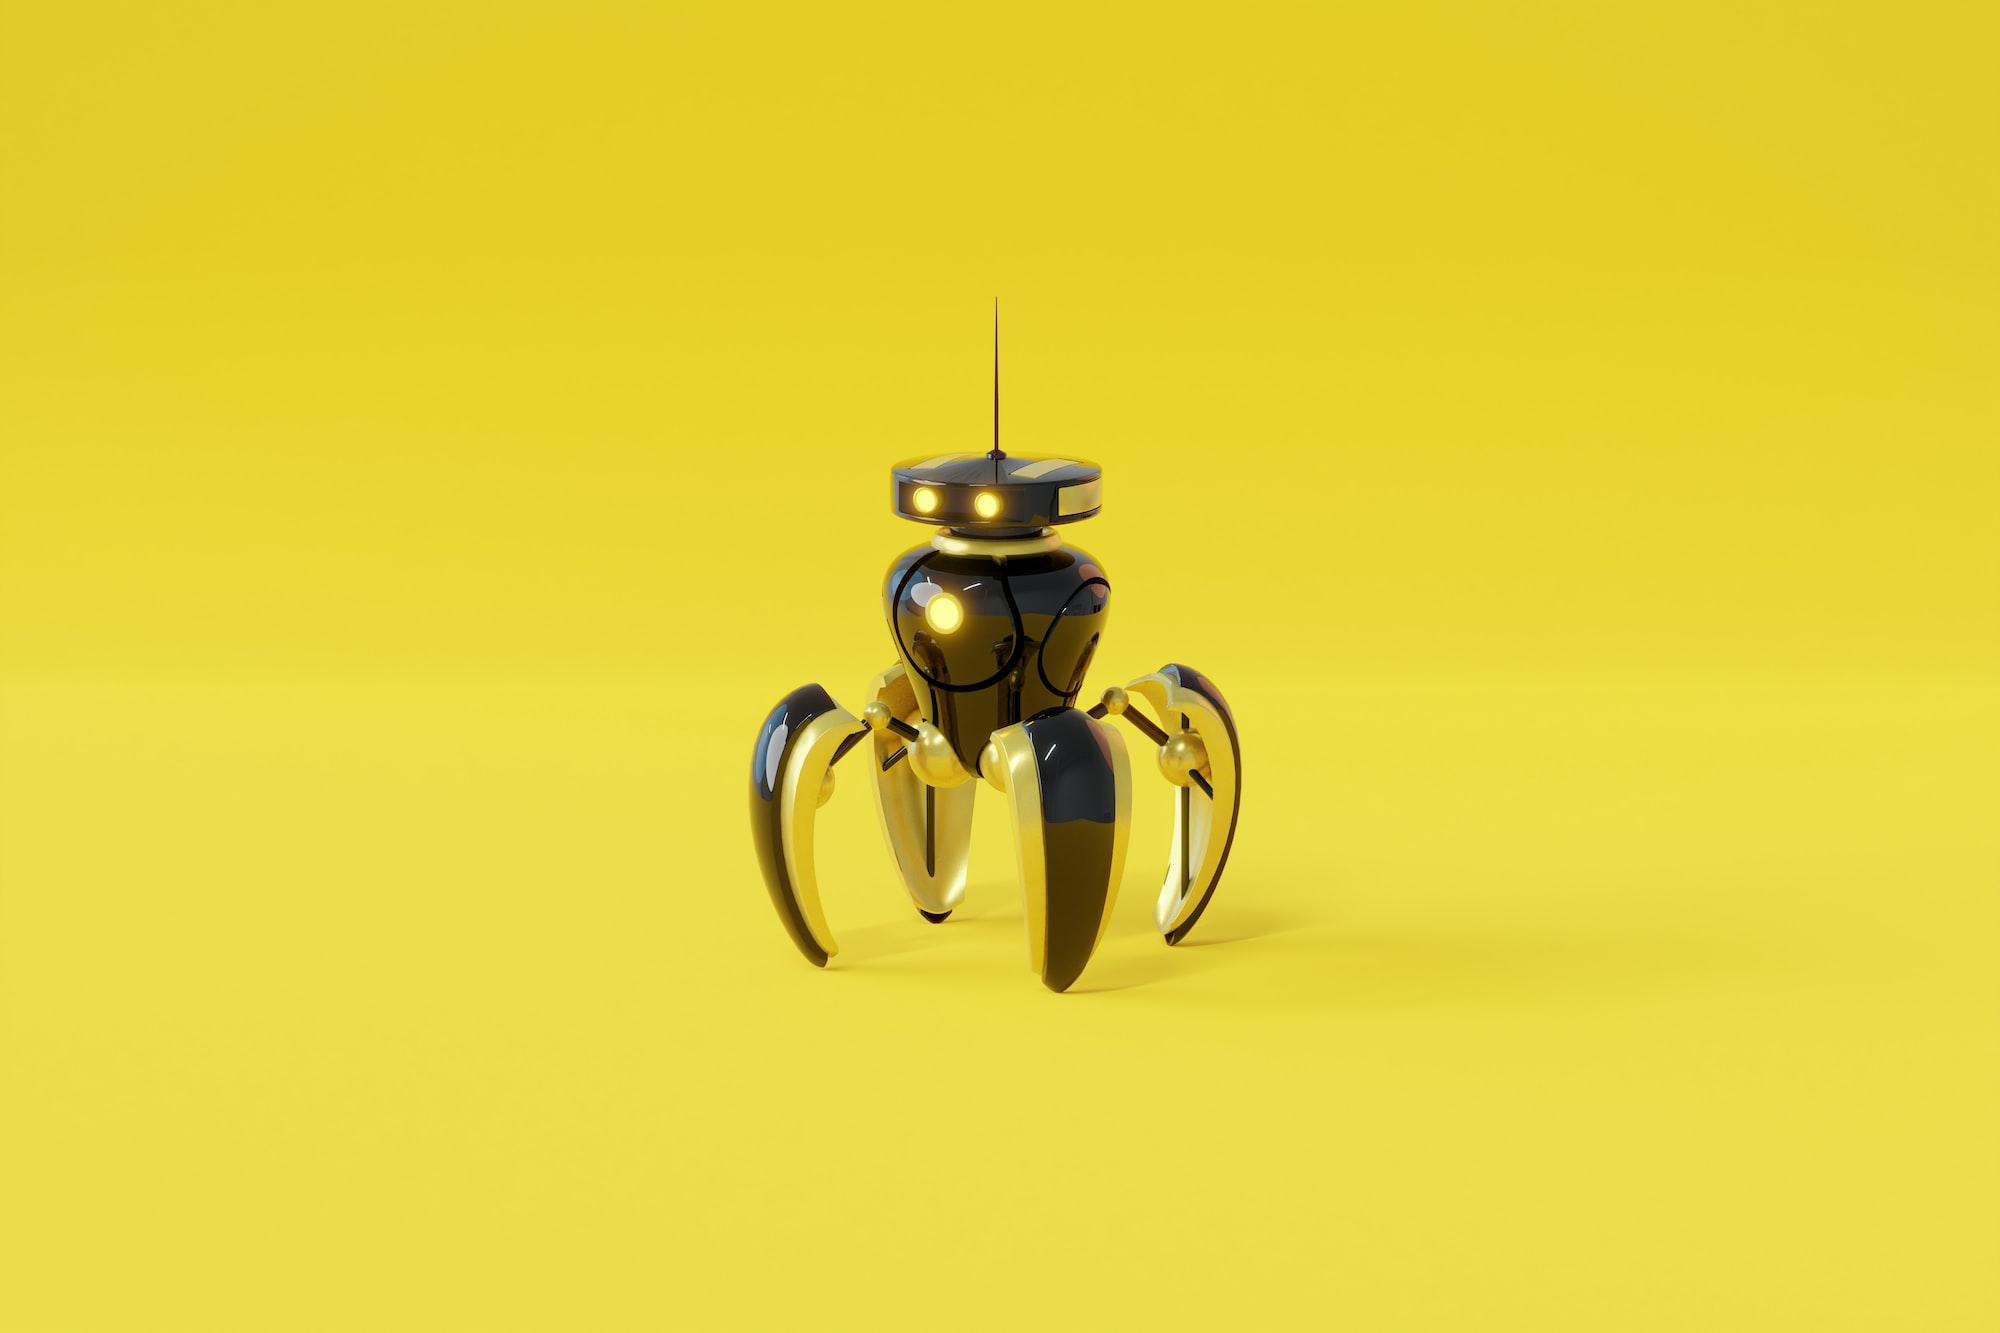 Philosophie et psychanalyse du robot